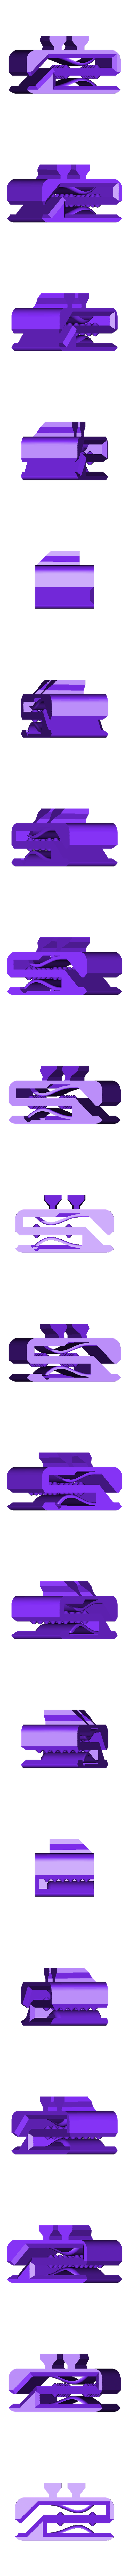 Towel_Basket_Main_clip.stl Download free STL file The Next Towel • 3D printer template, AcE-Craft